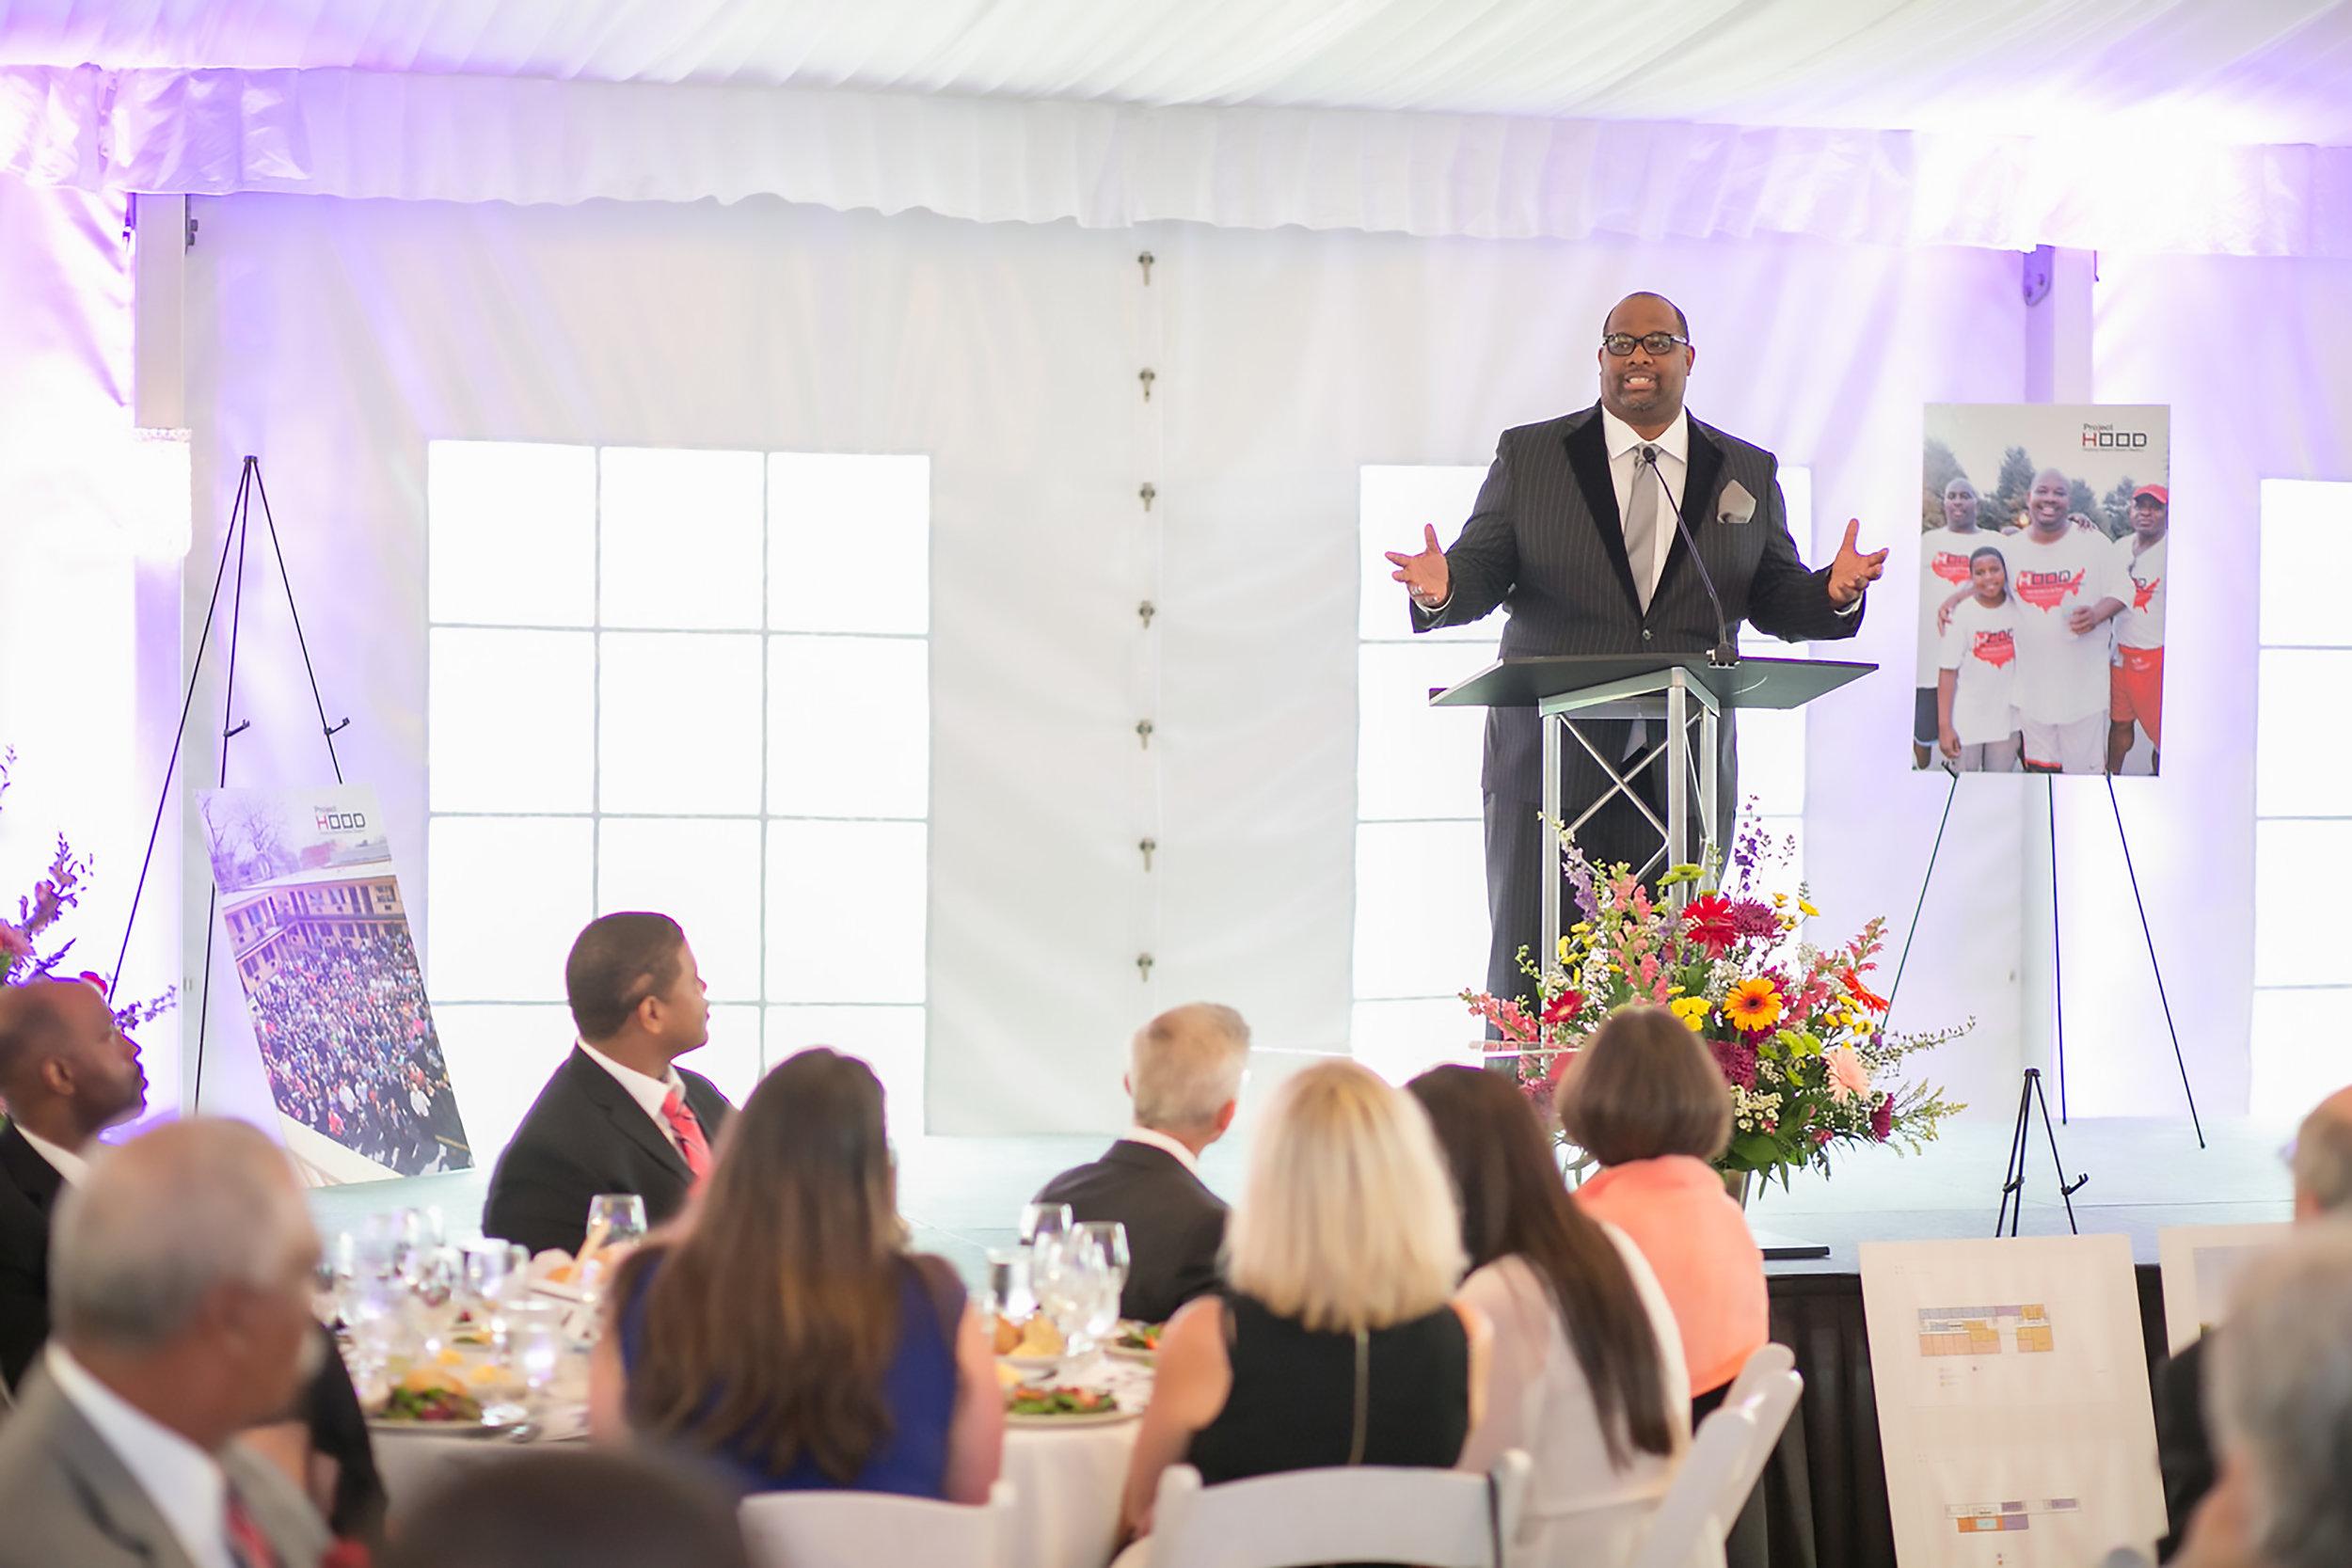 Pastor Corey B. Brooks, Executive Director of Project H.O.O.D.